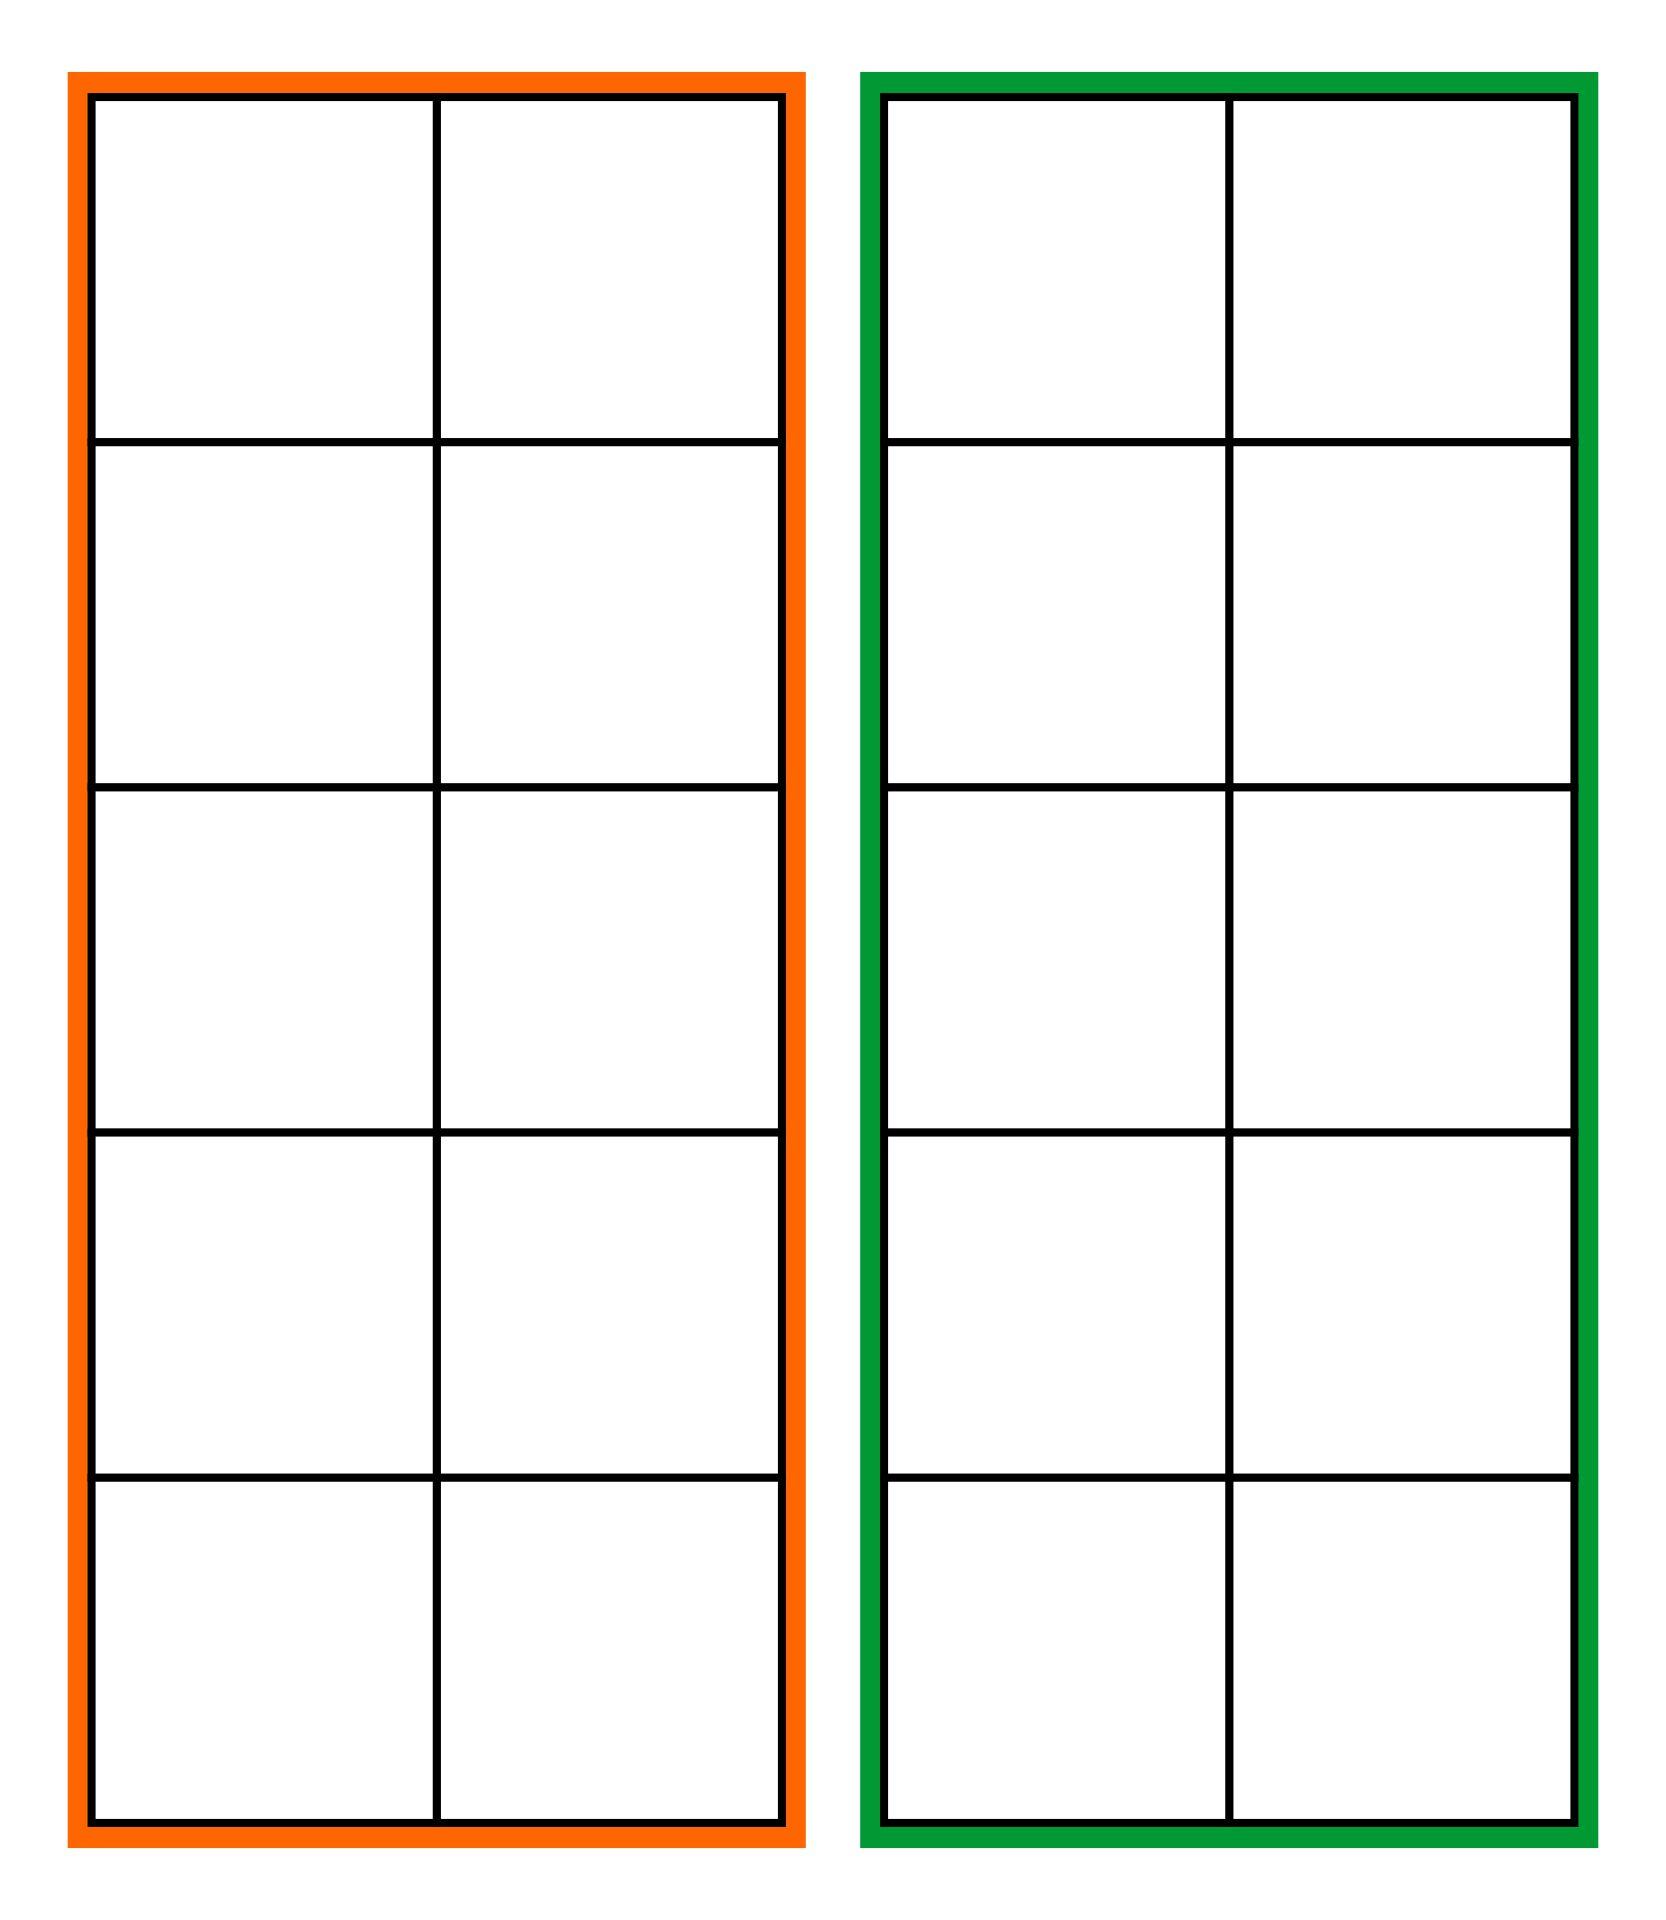 Best Images of Ten Frame Template Printable - Blank Ten Frames ...